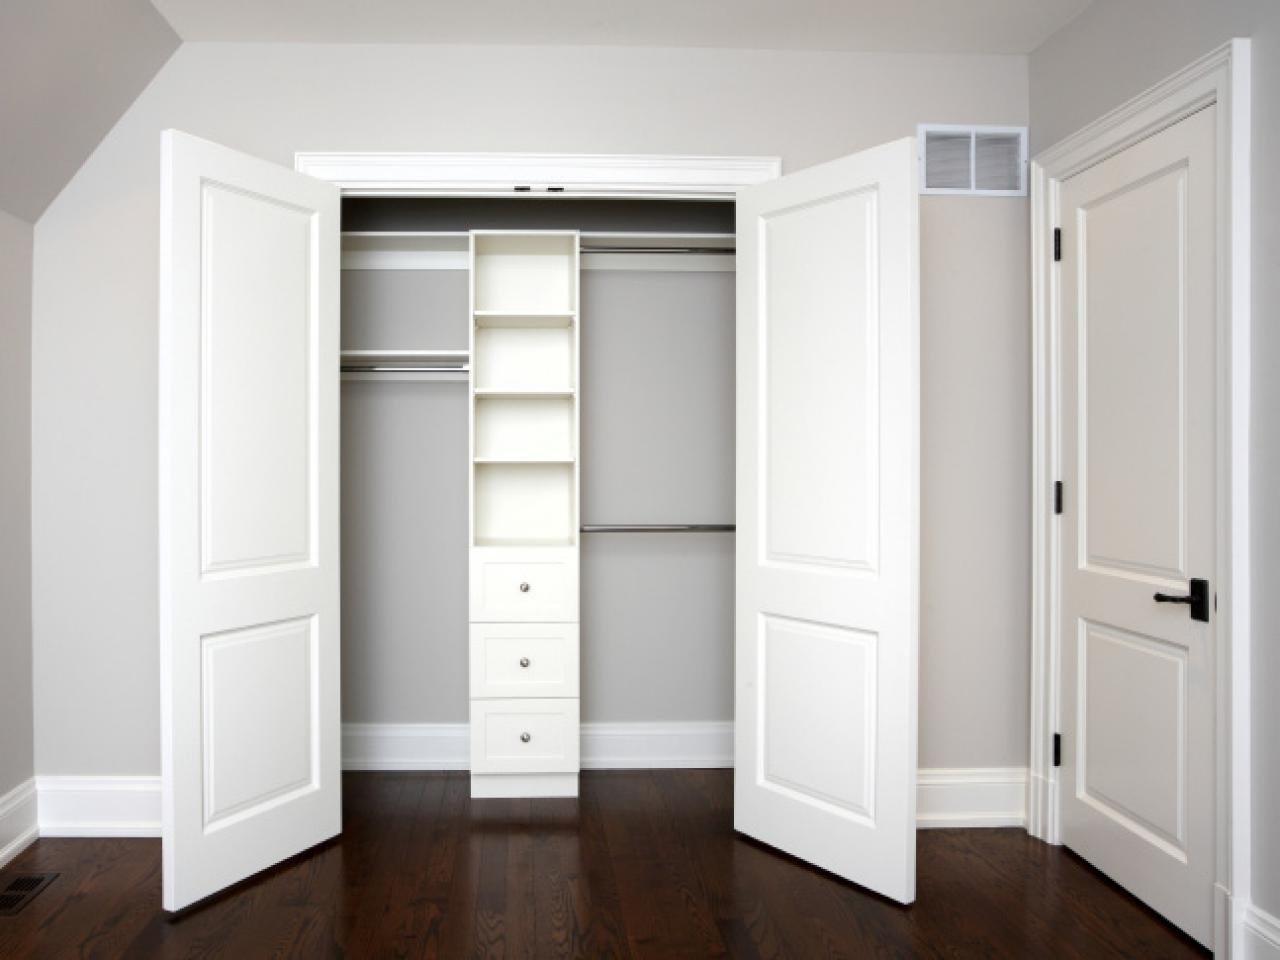 Cool Ideas For Closet Doors — Randolph Indoor and Outdoor Design